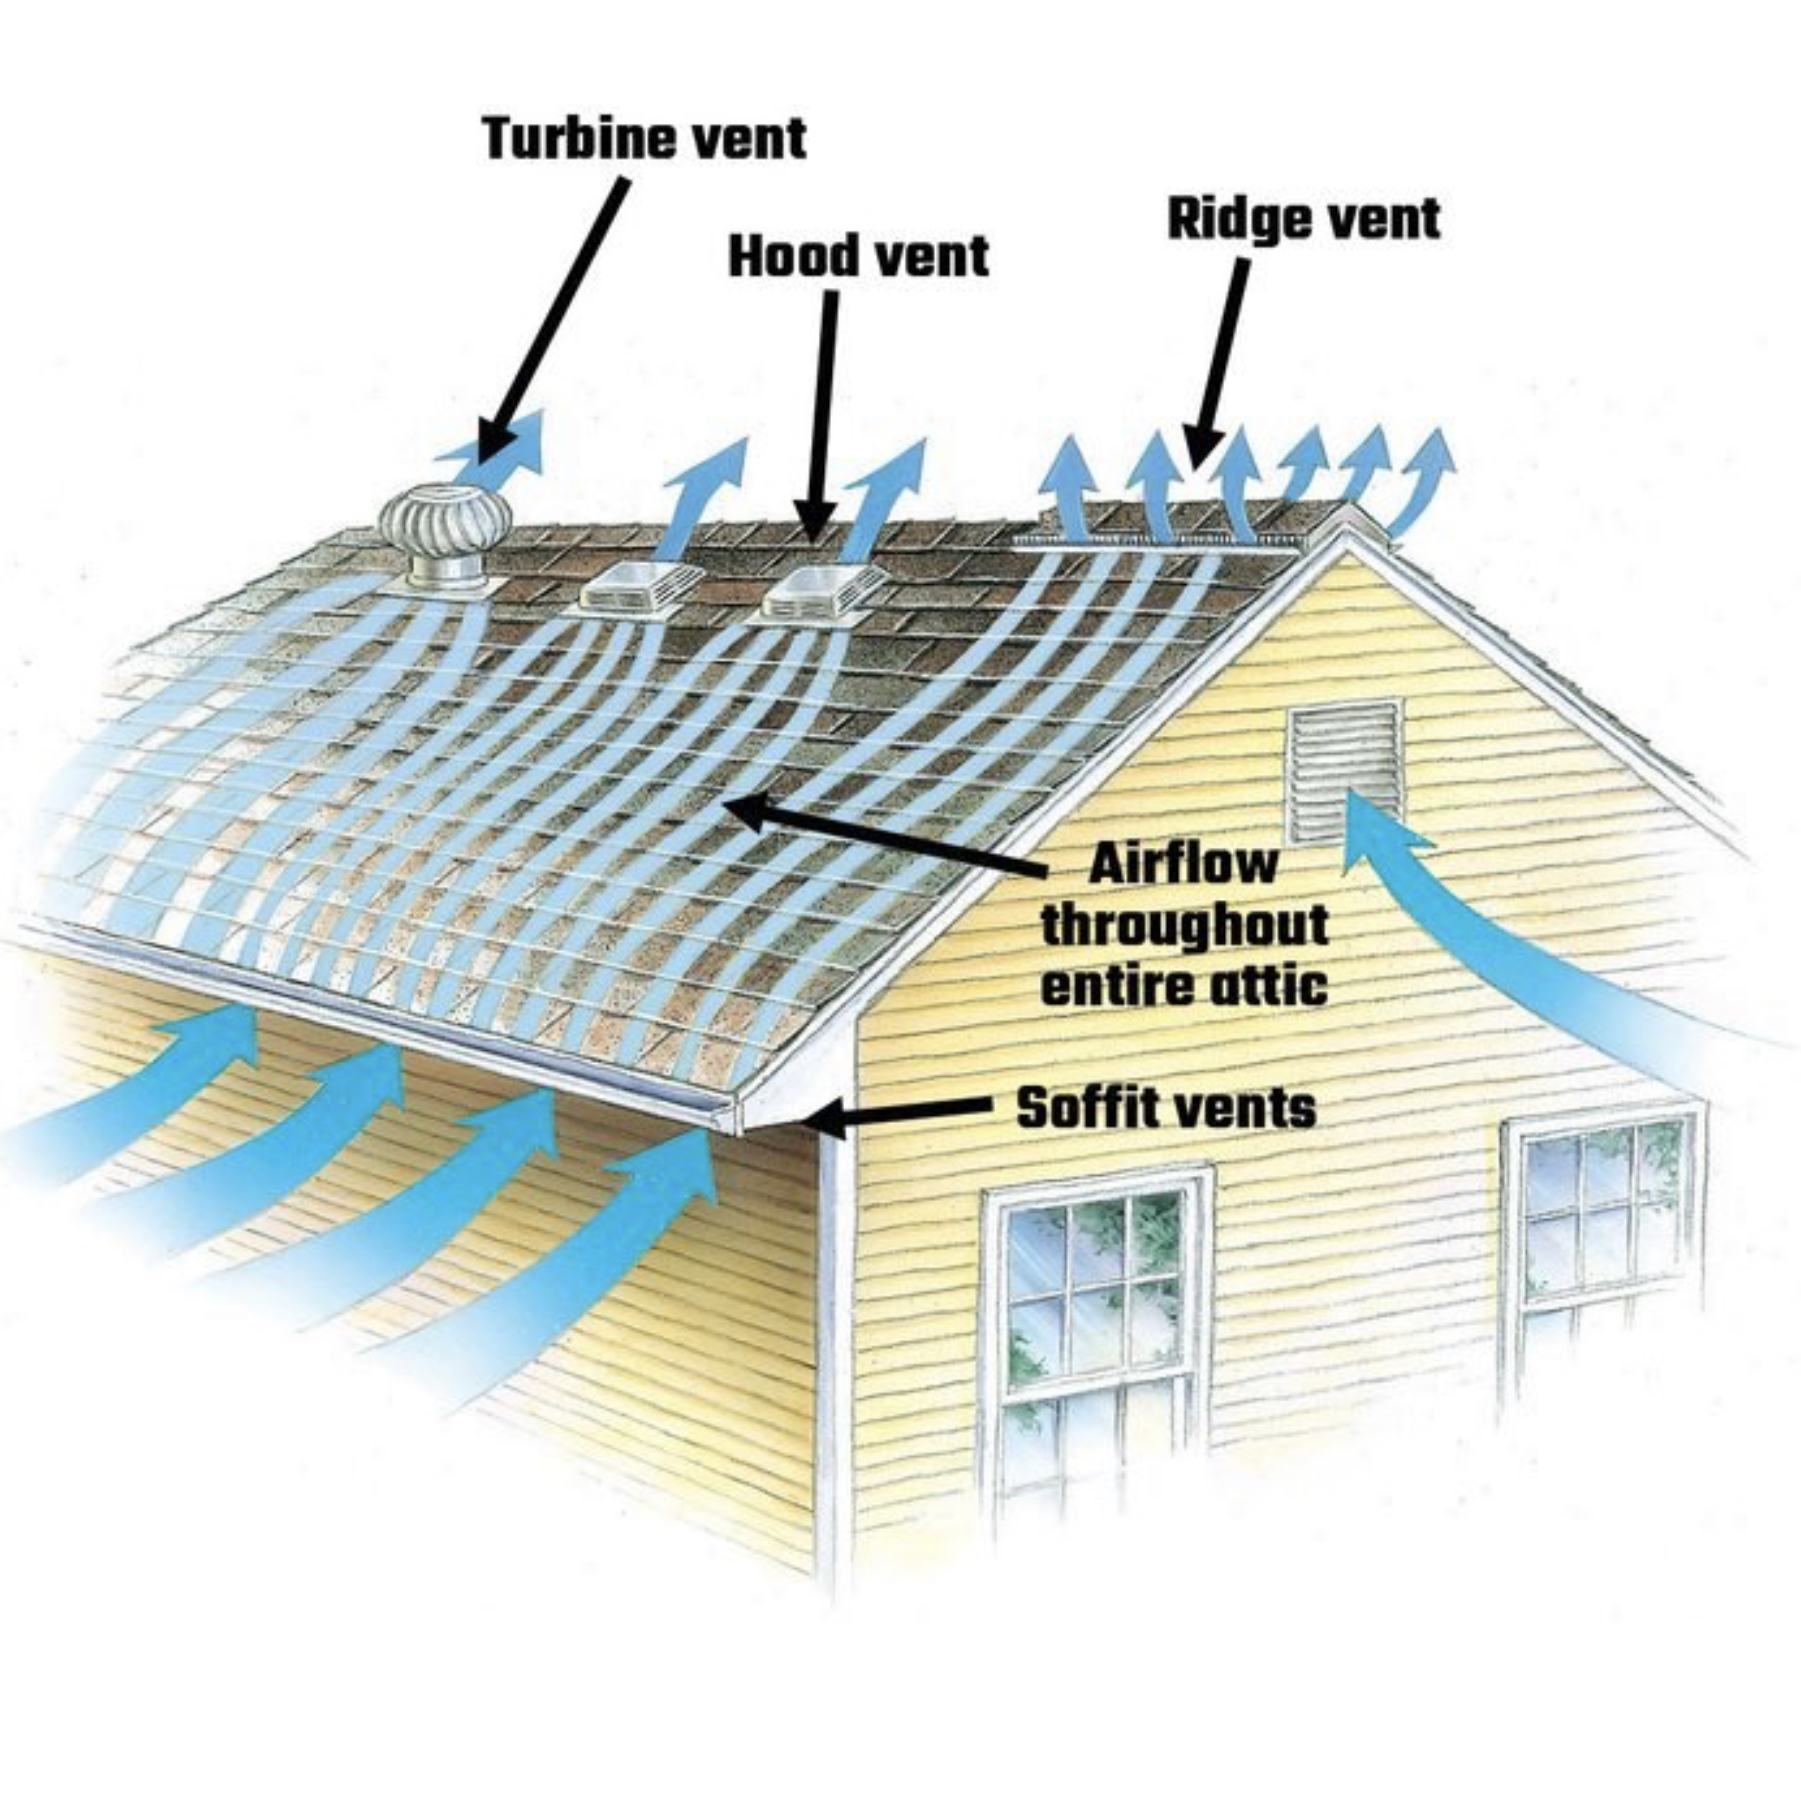 A diagram of proper attic airflow